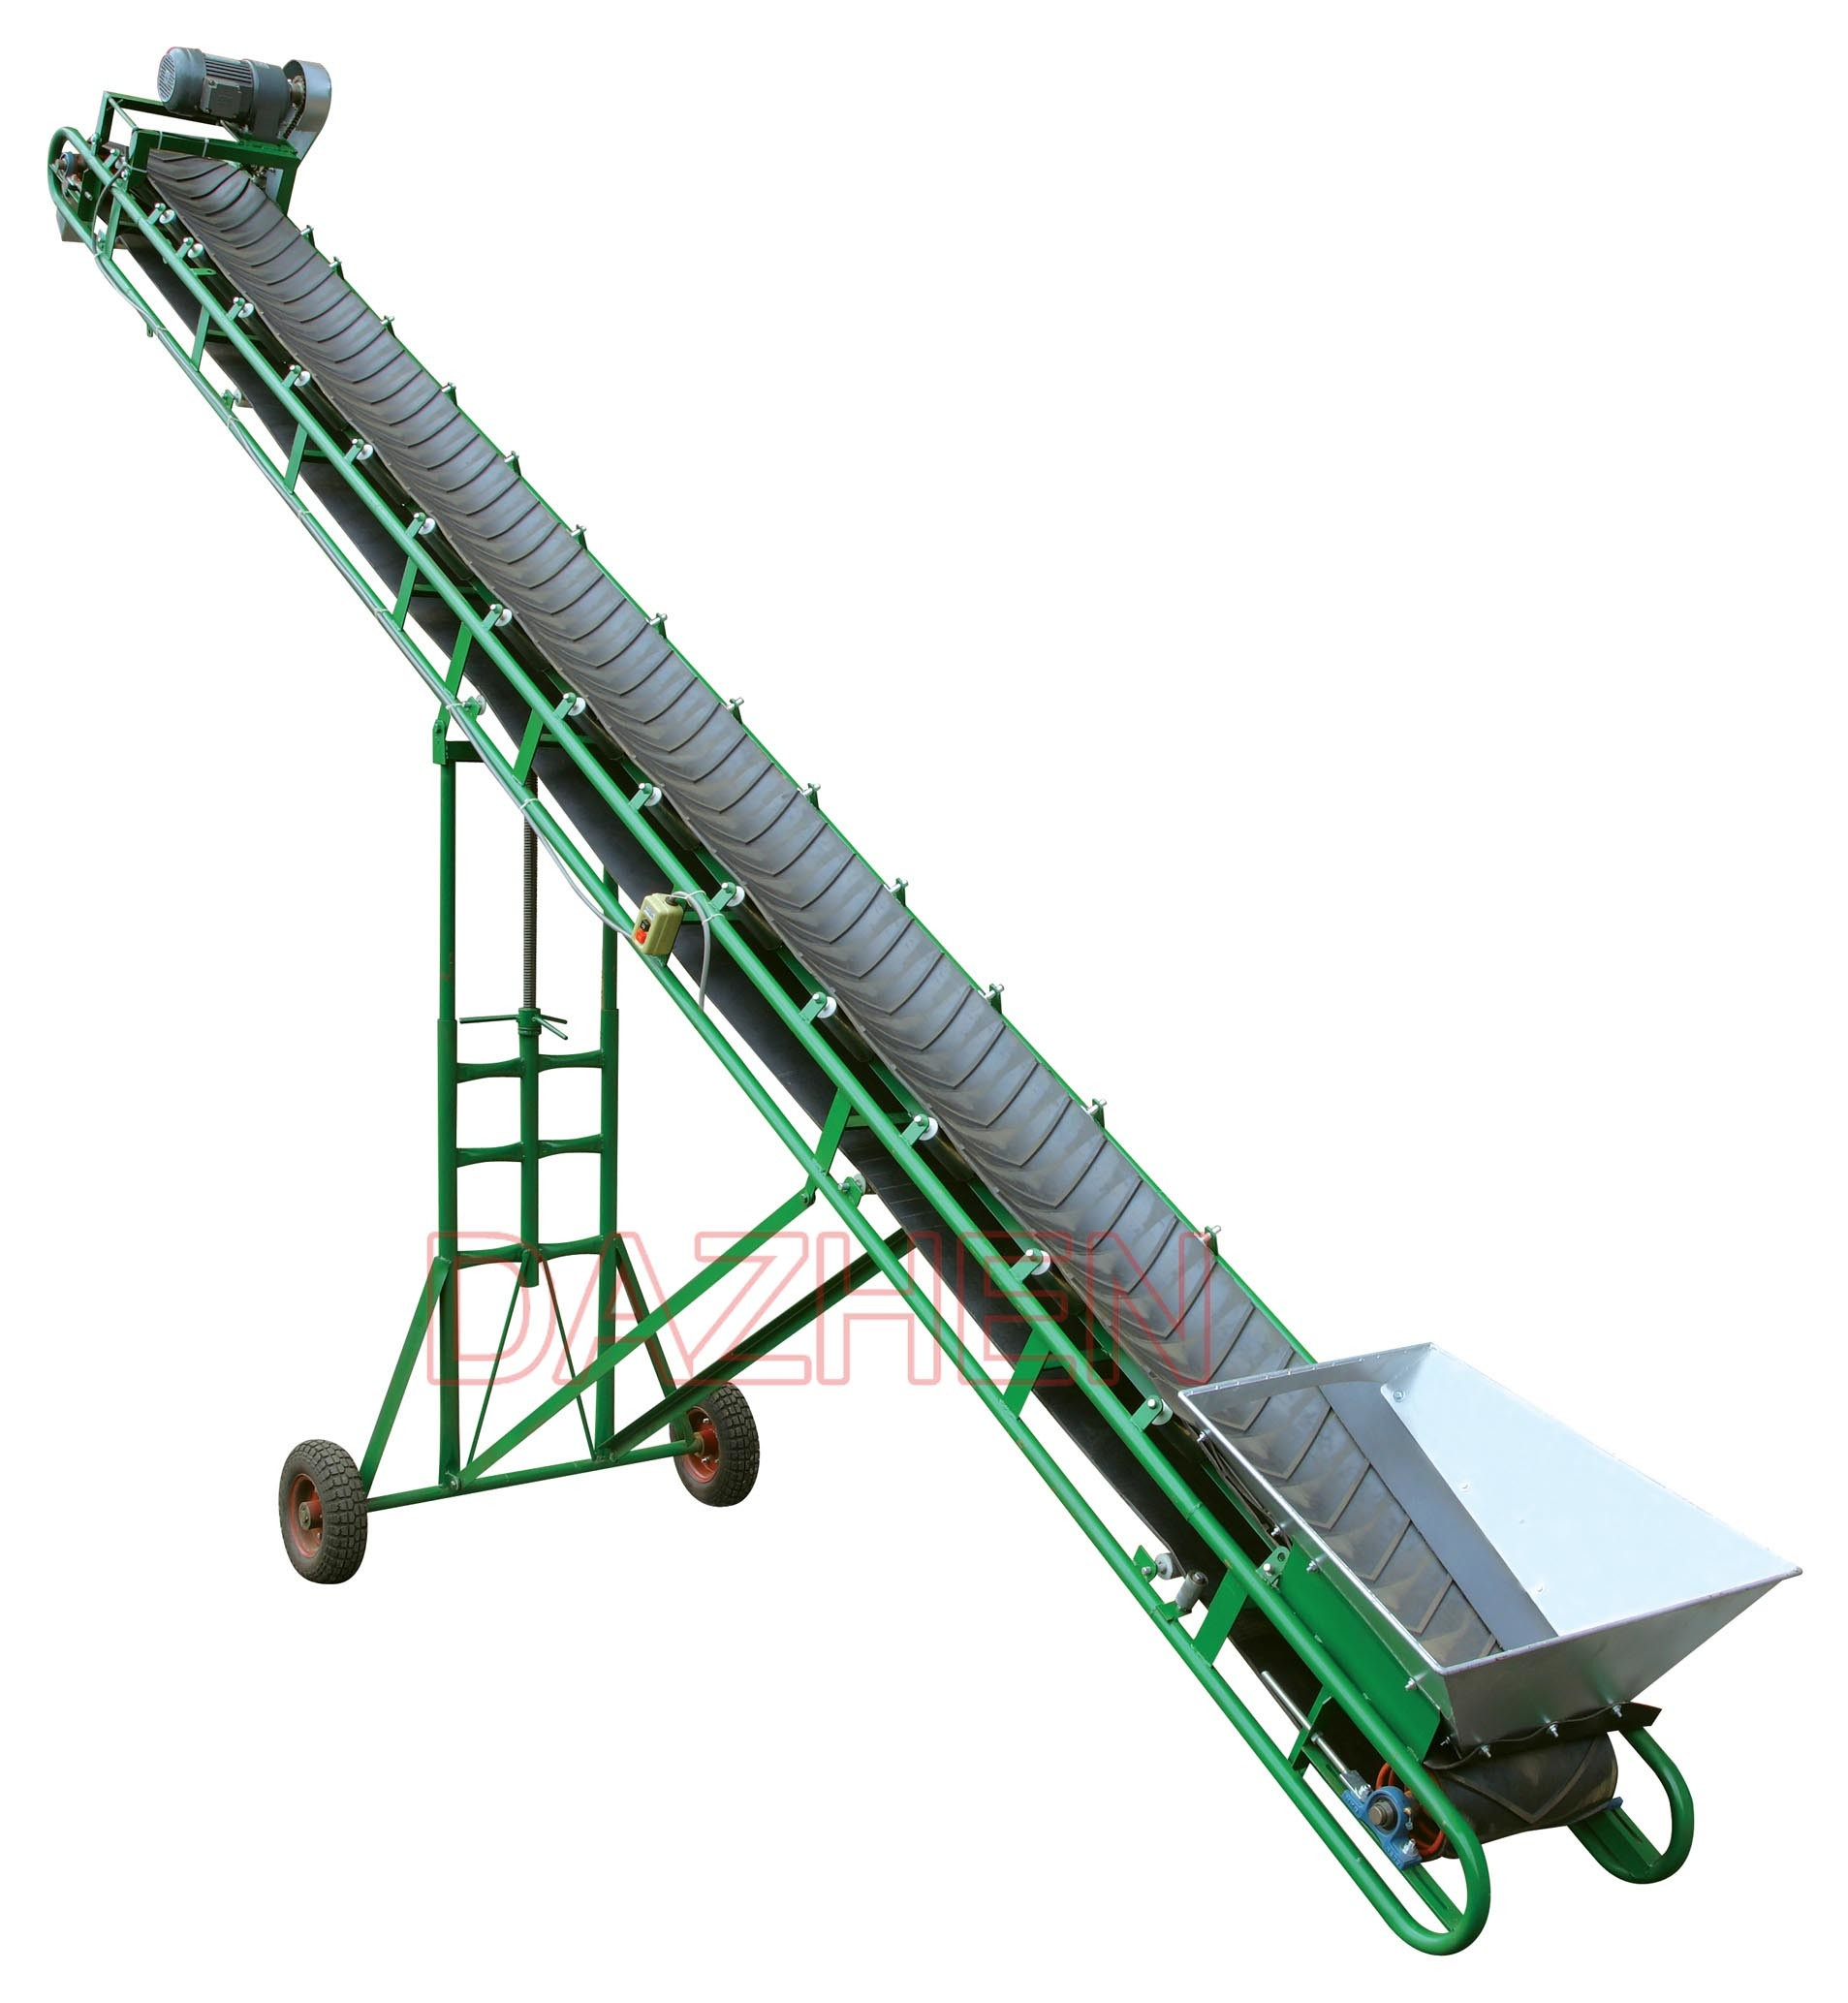 inclined belt conveyor Manufacturer of belt conveyors - inclined belt conveyor, truck loading conveyor, conveyor belt and bag handling conveyor offered by star material handling projects, delhi.